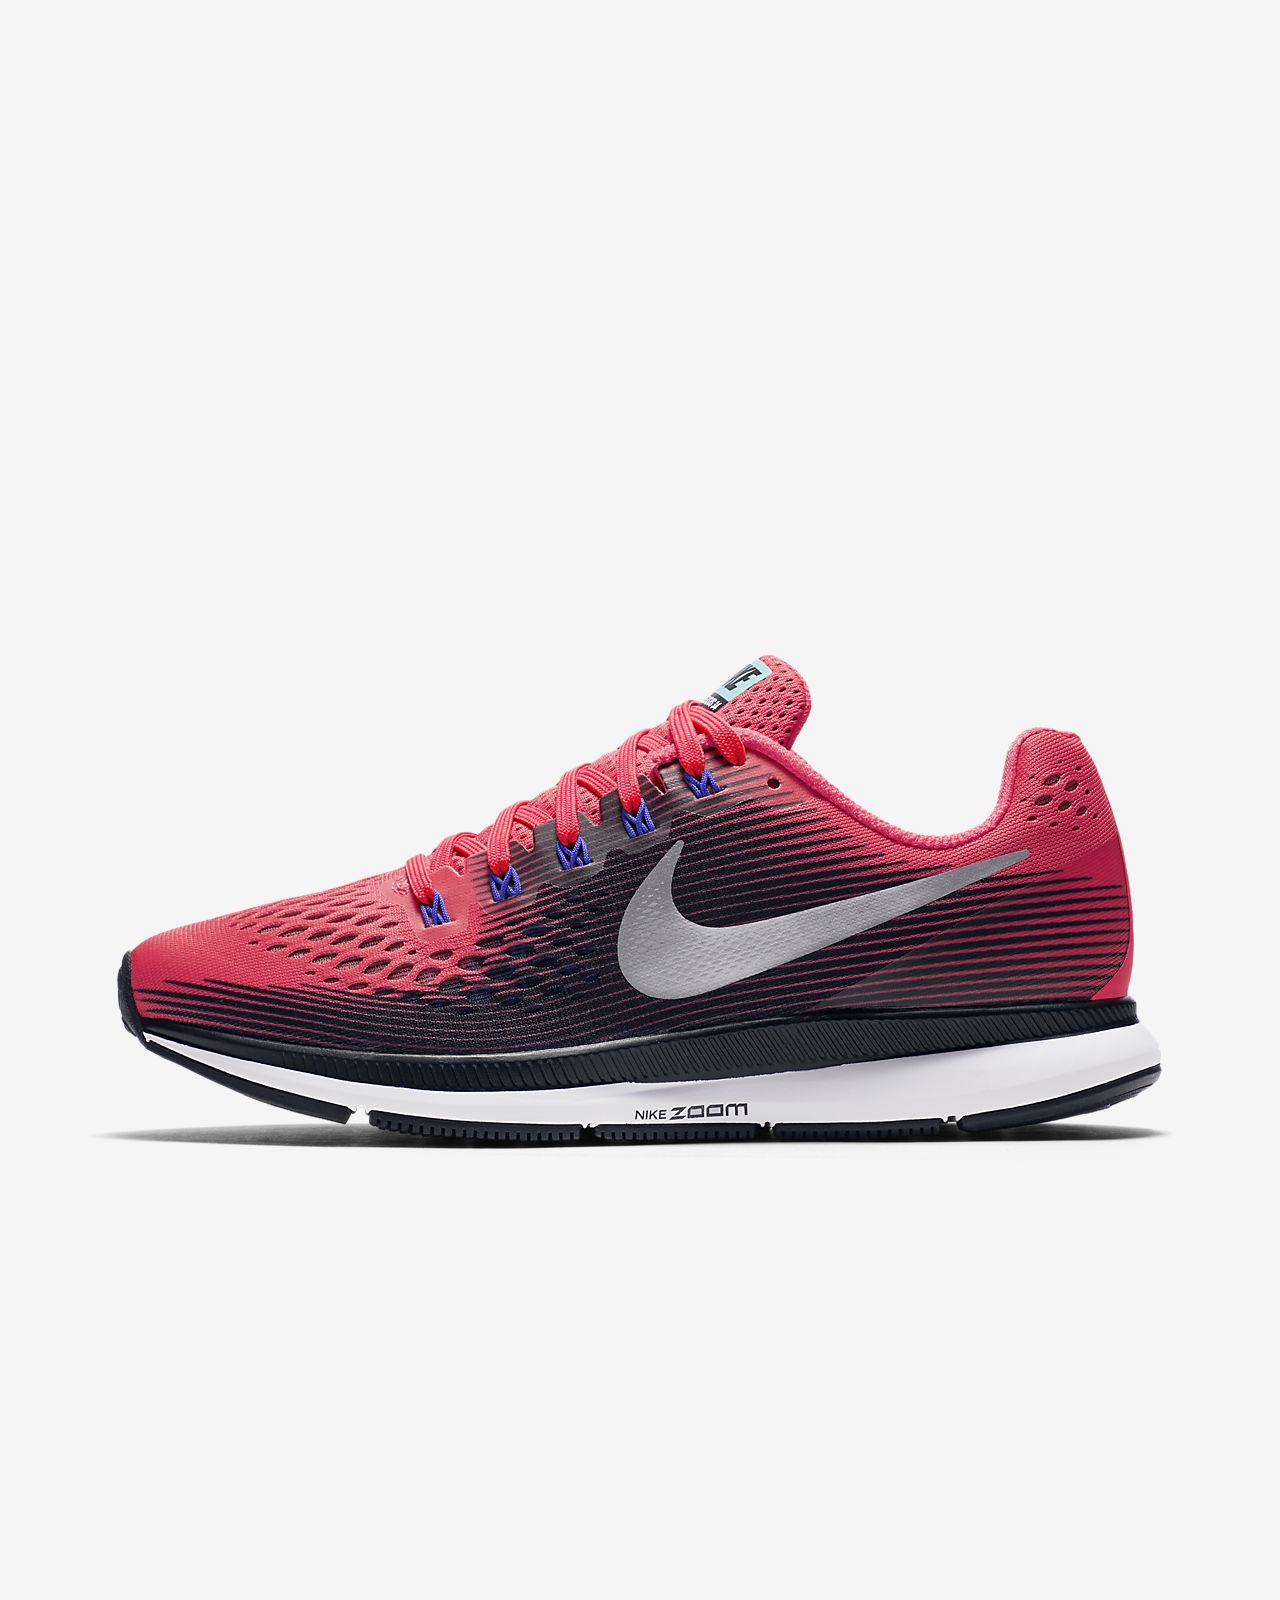 bfc804144e7a5 ... black white sport chek 48731 b52b1  discount code for nike air zoom  pegasus 34 womens running shoe aeec9 cdb25